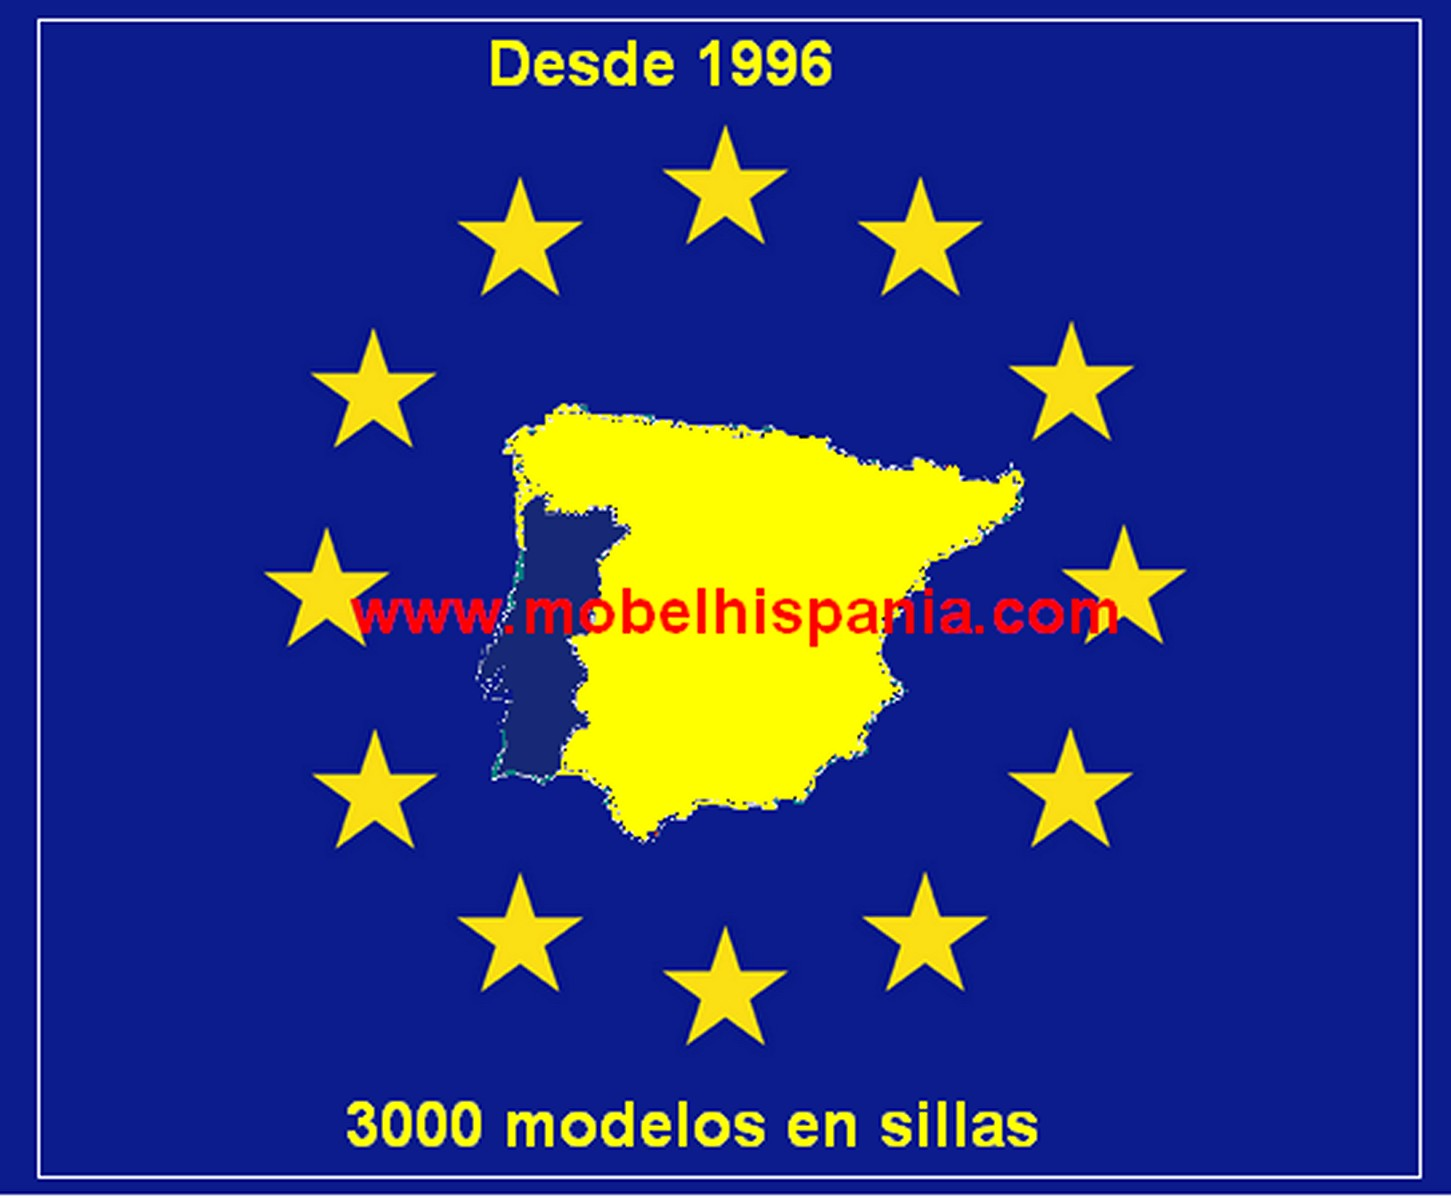 Mobelhispania